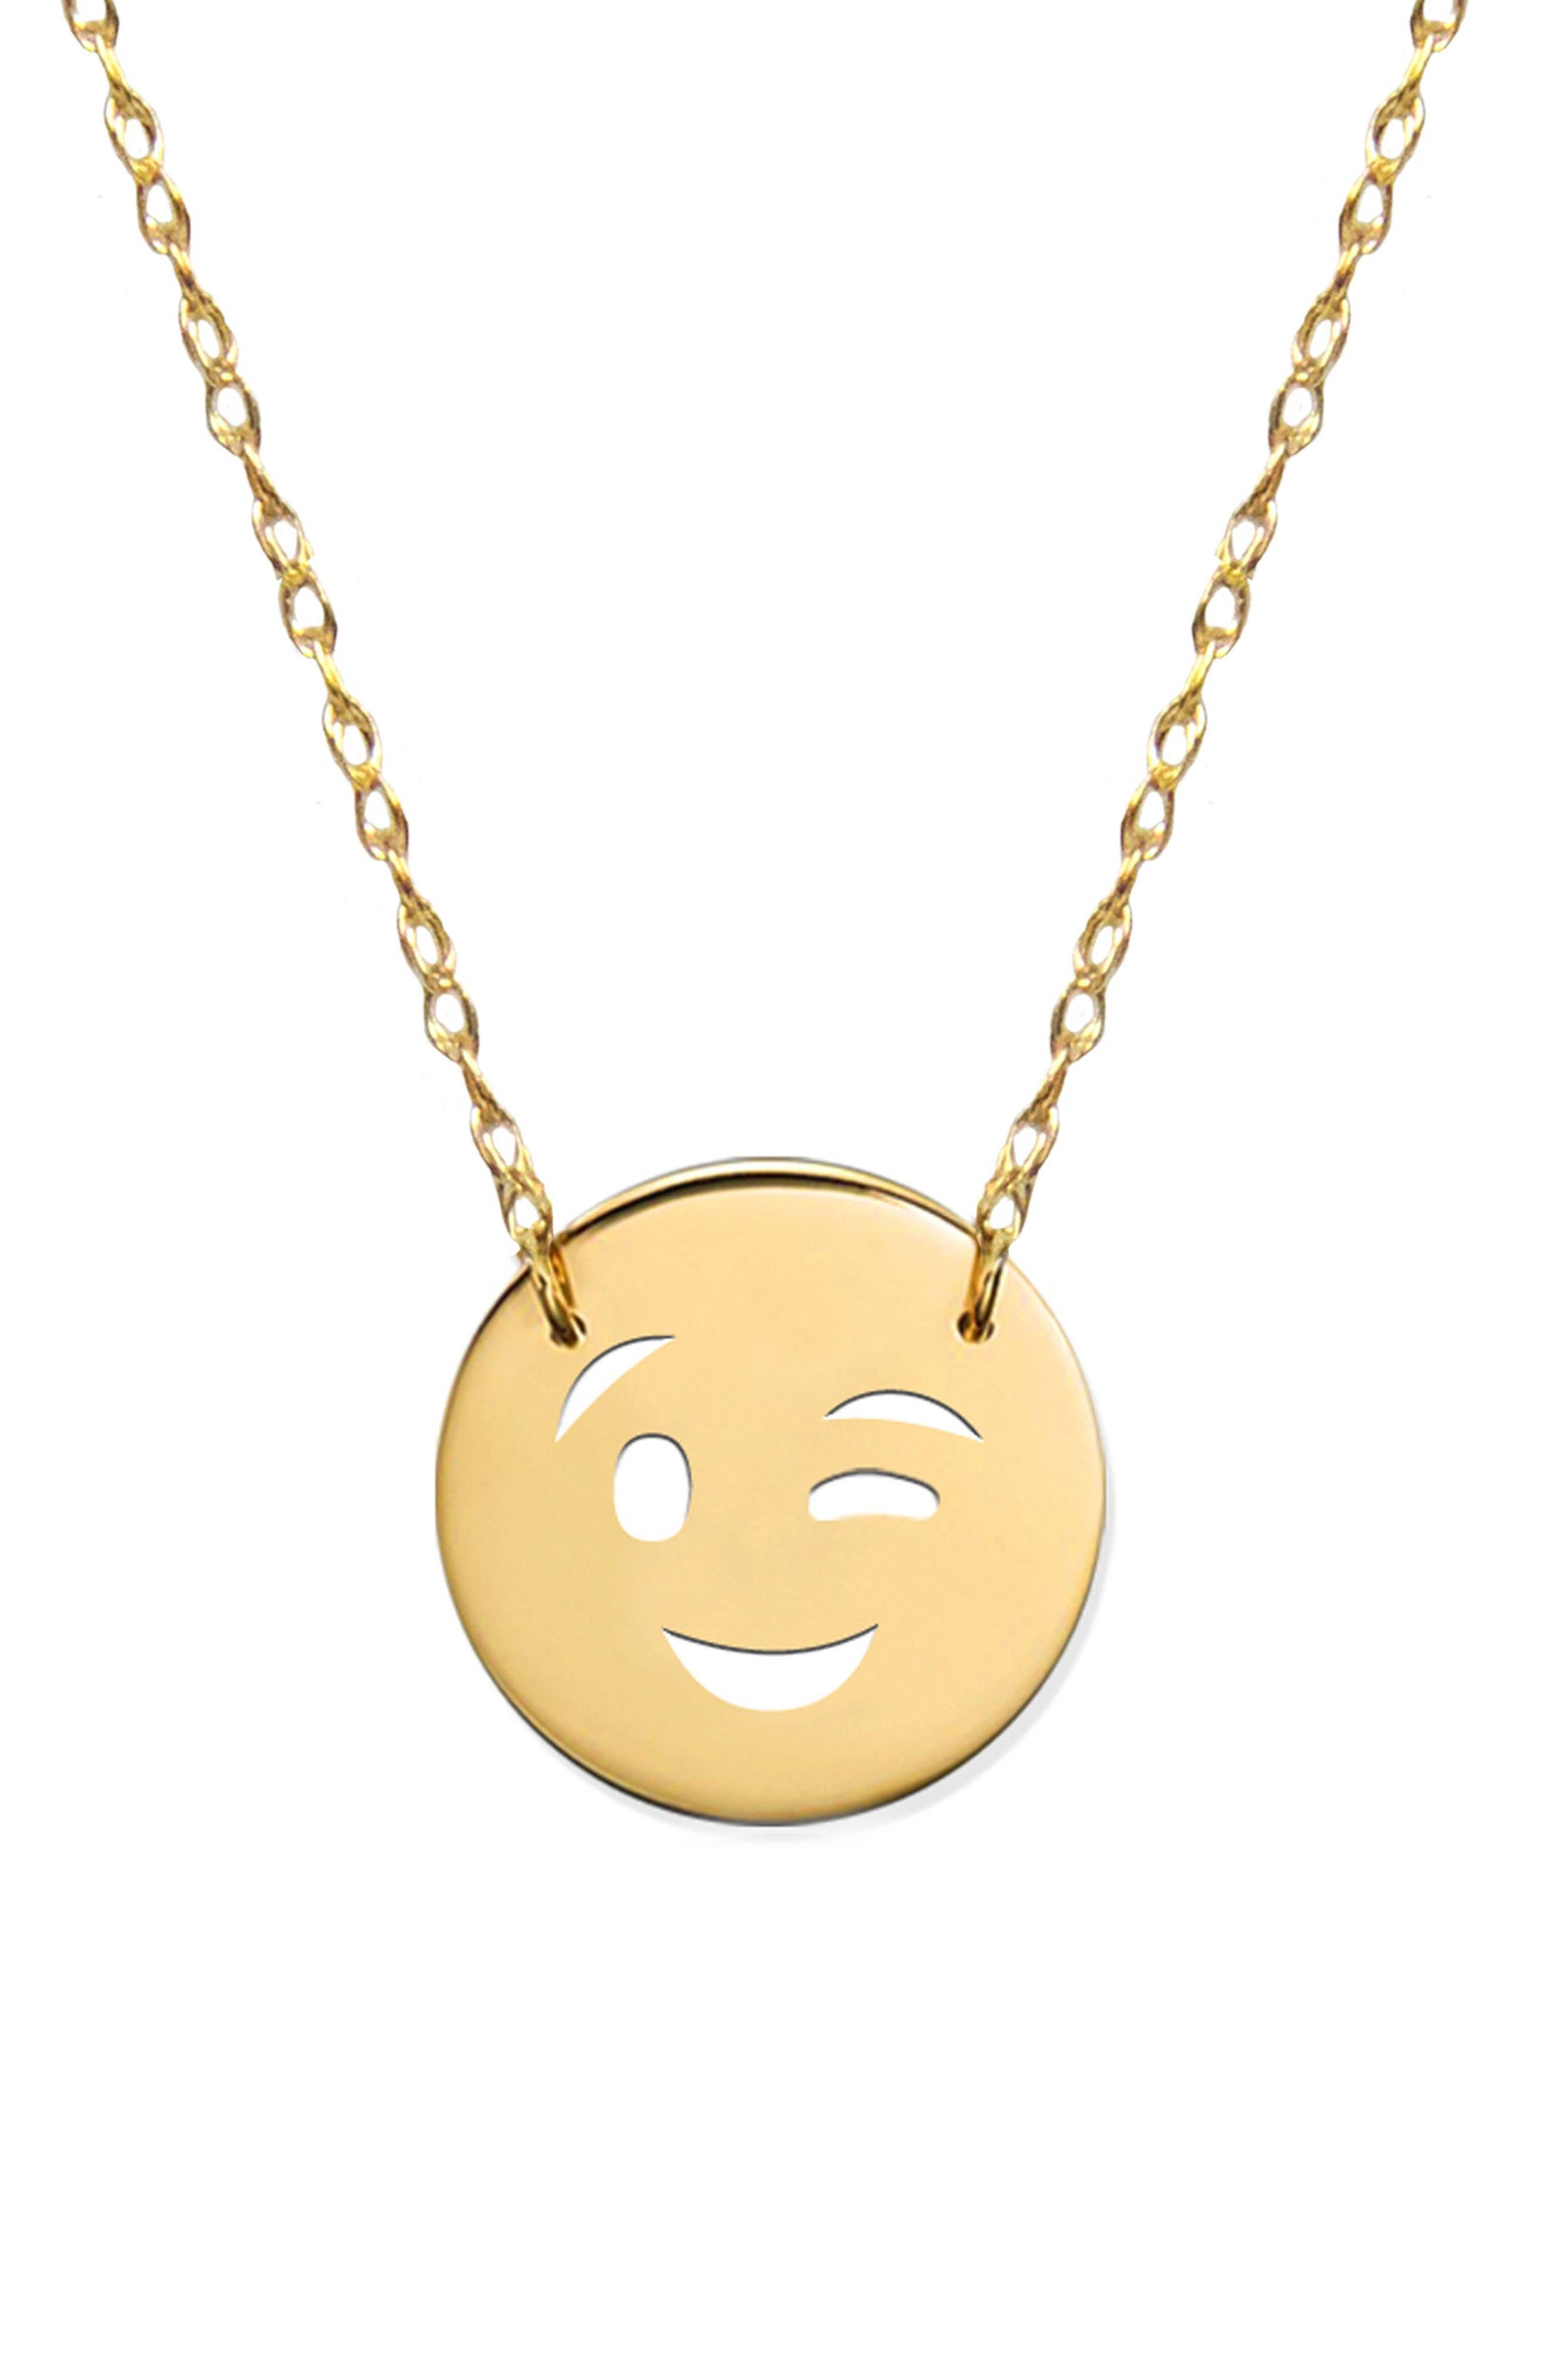 Alternate Image 1 Selected - Jane Basch Designs Wink Emoji Pendant Necklace (Nordstrom Exclusive)